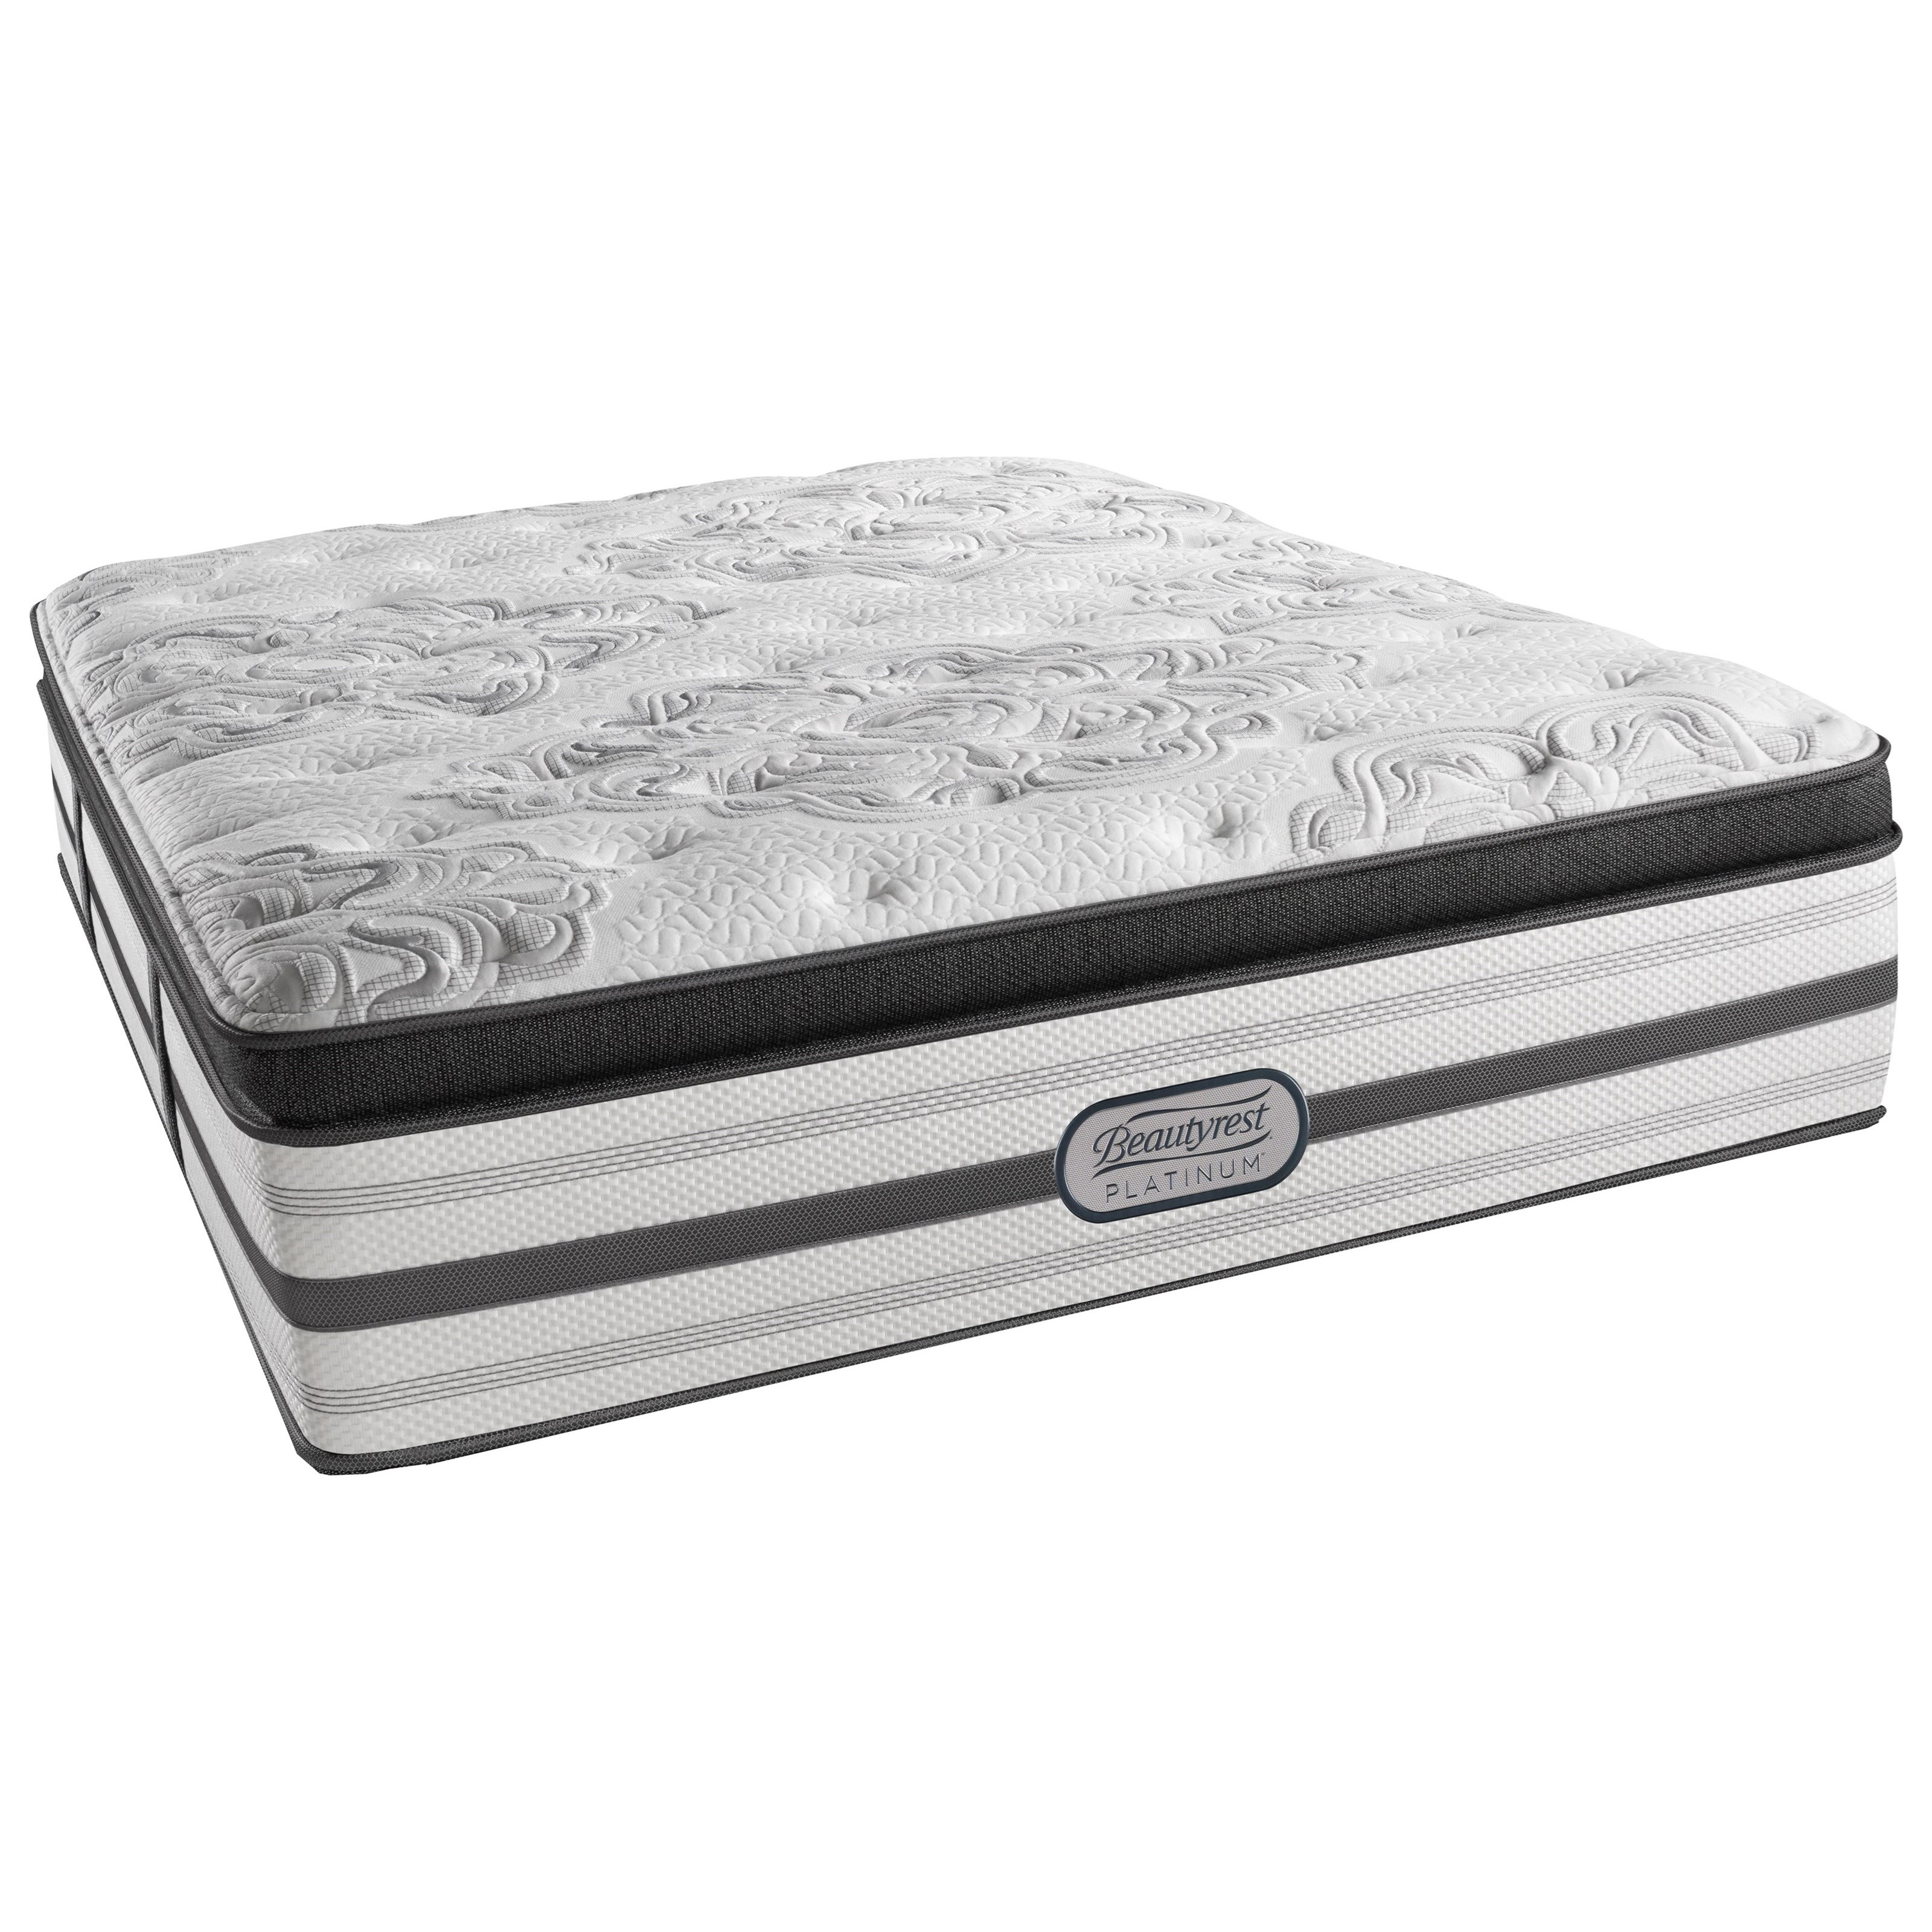 Beautyrest Platinum Katherine Queen Plush Box Top Adjustable Set - Item Number: LV4PLBT-Q+SM3-Q